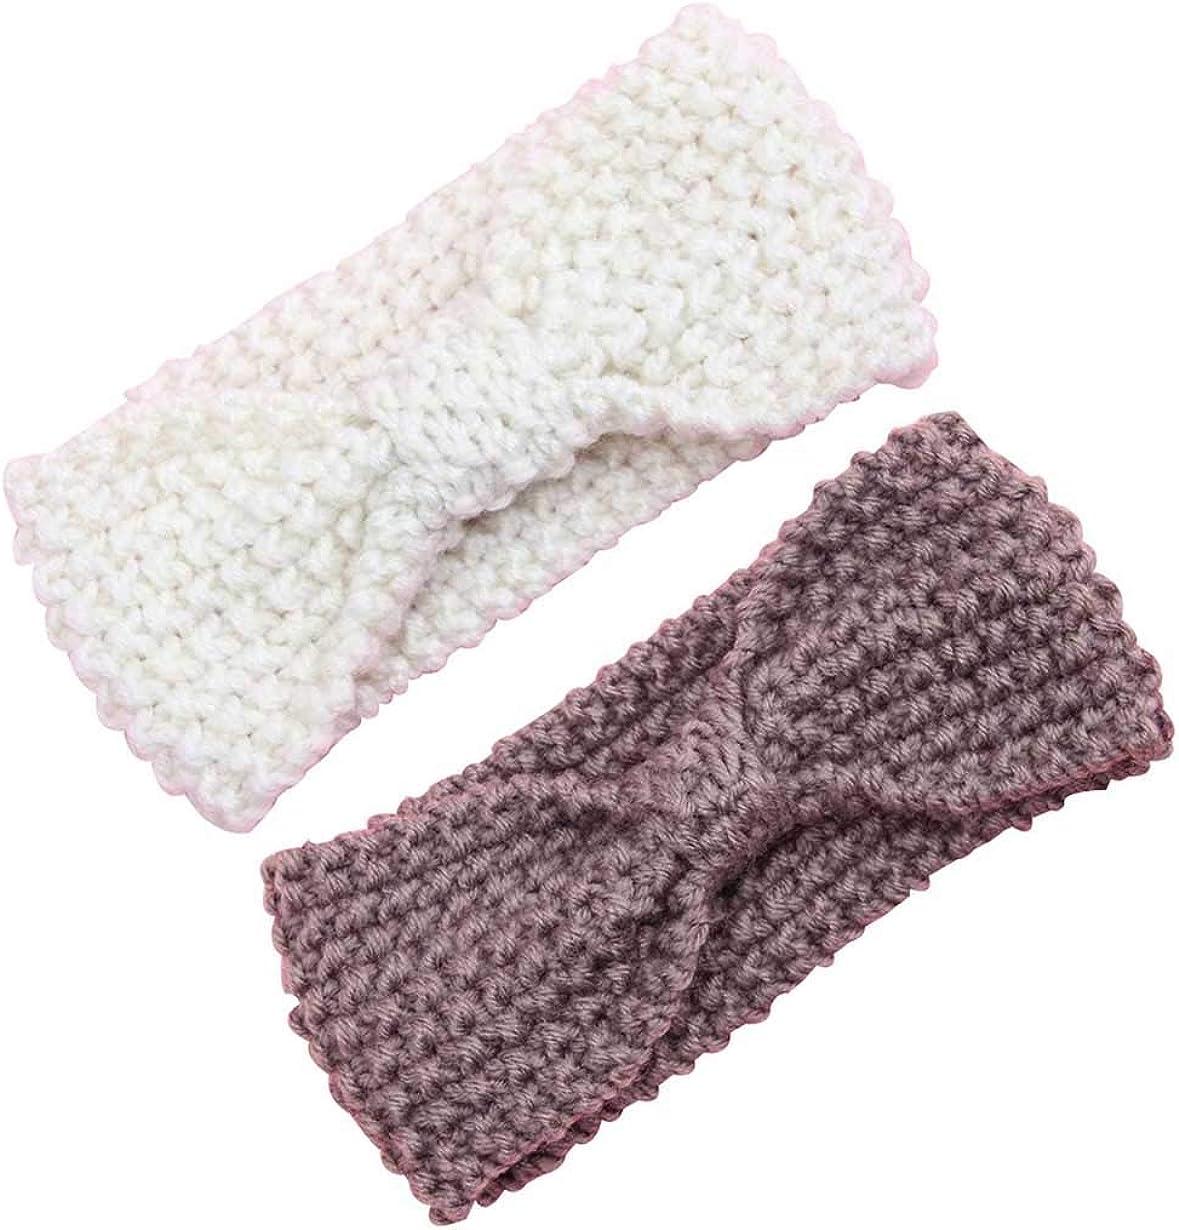 Baby Ear Warmers Fall Newborn Photo Prop Crochet Baby Bow Headband Baby Accessories Baby Shower Gift Toddler Custom Crochet